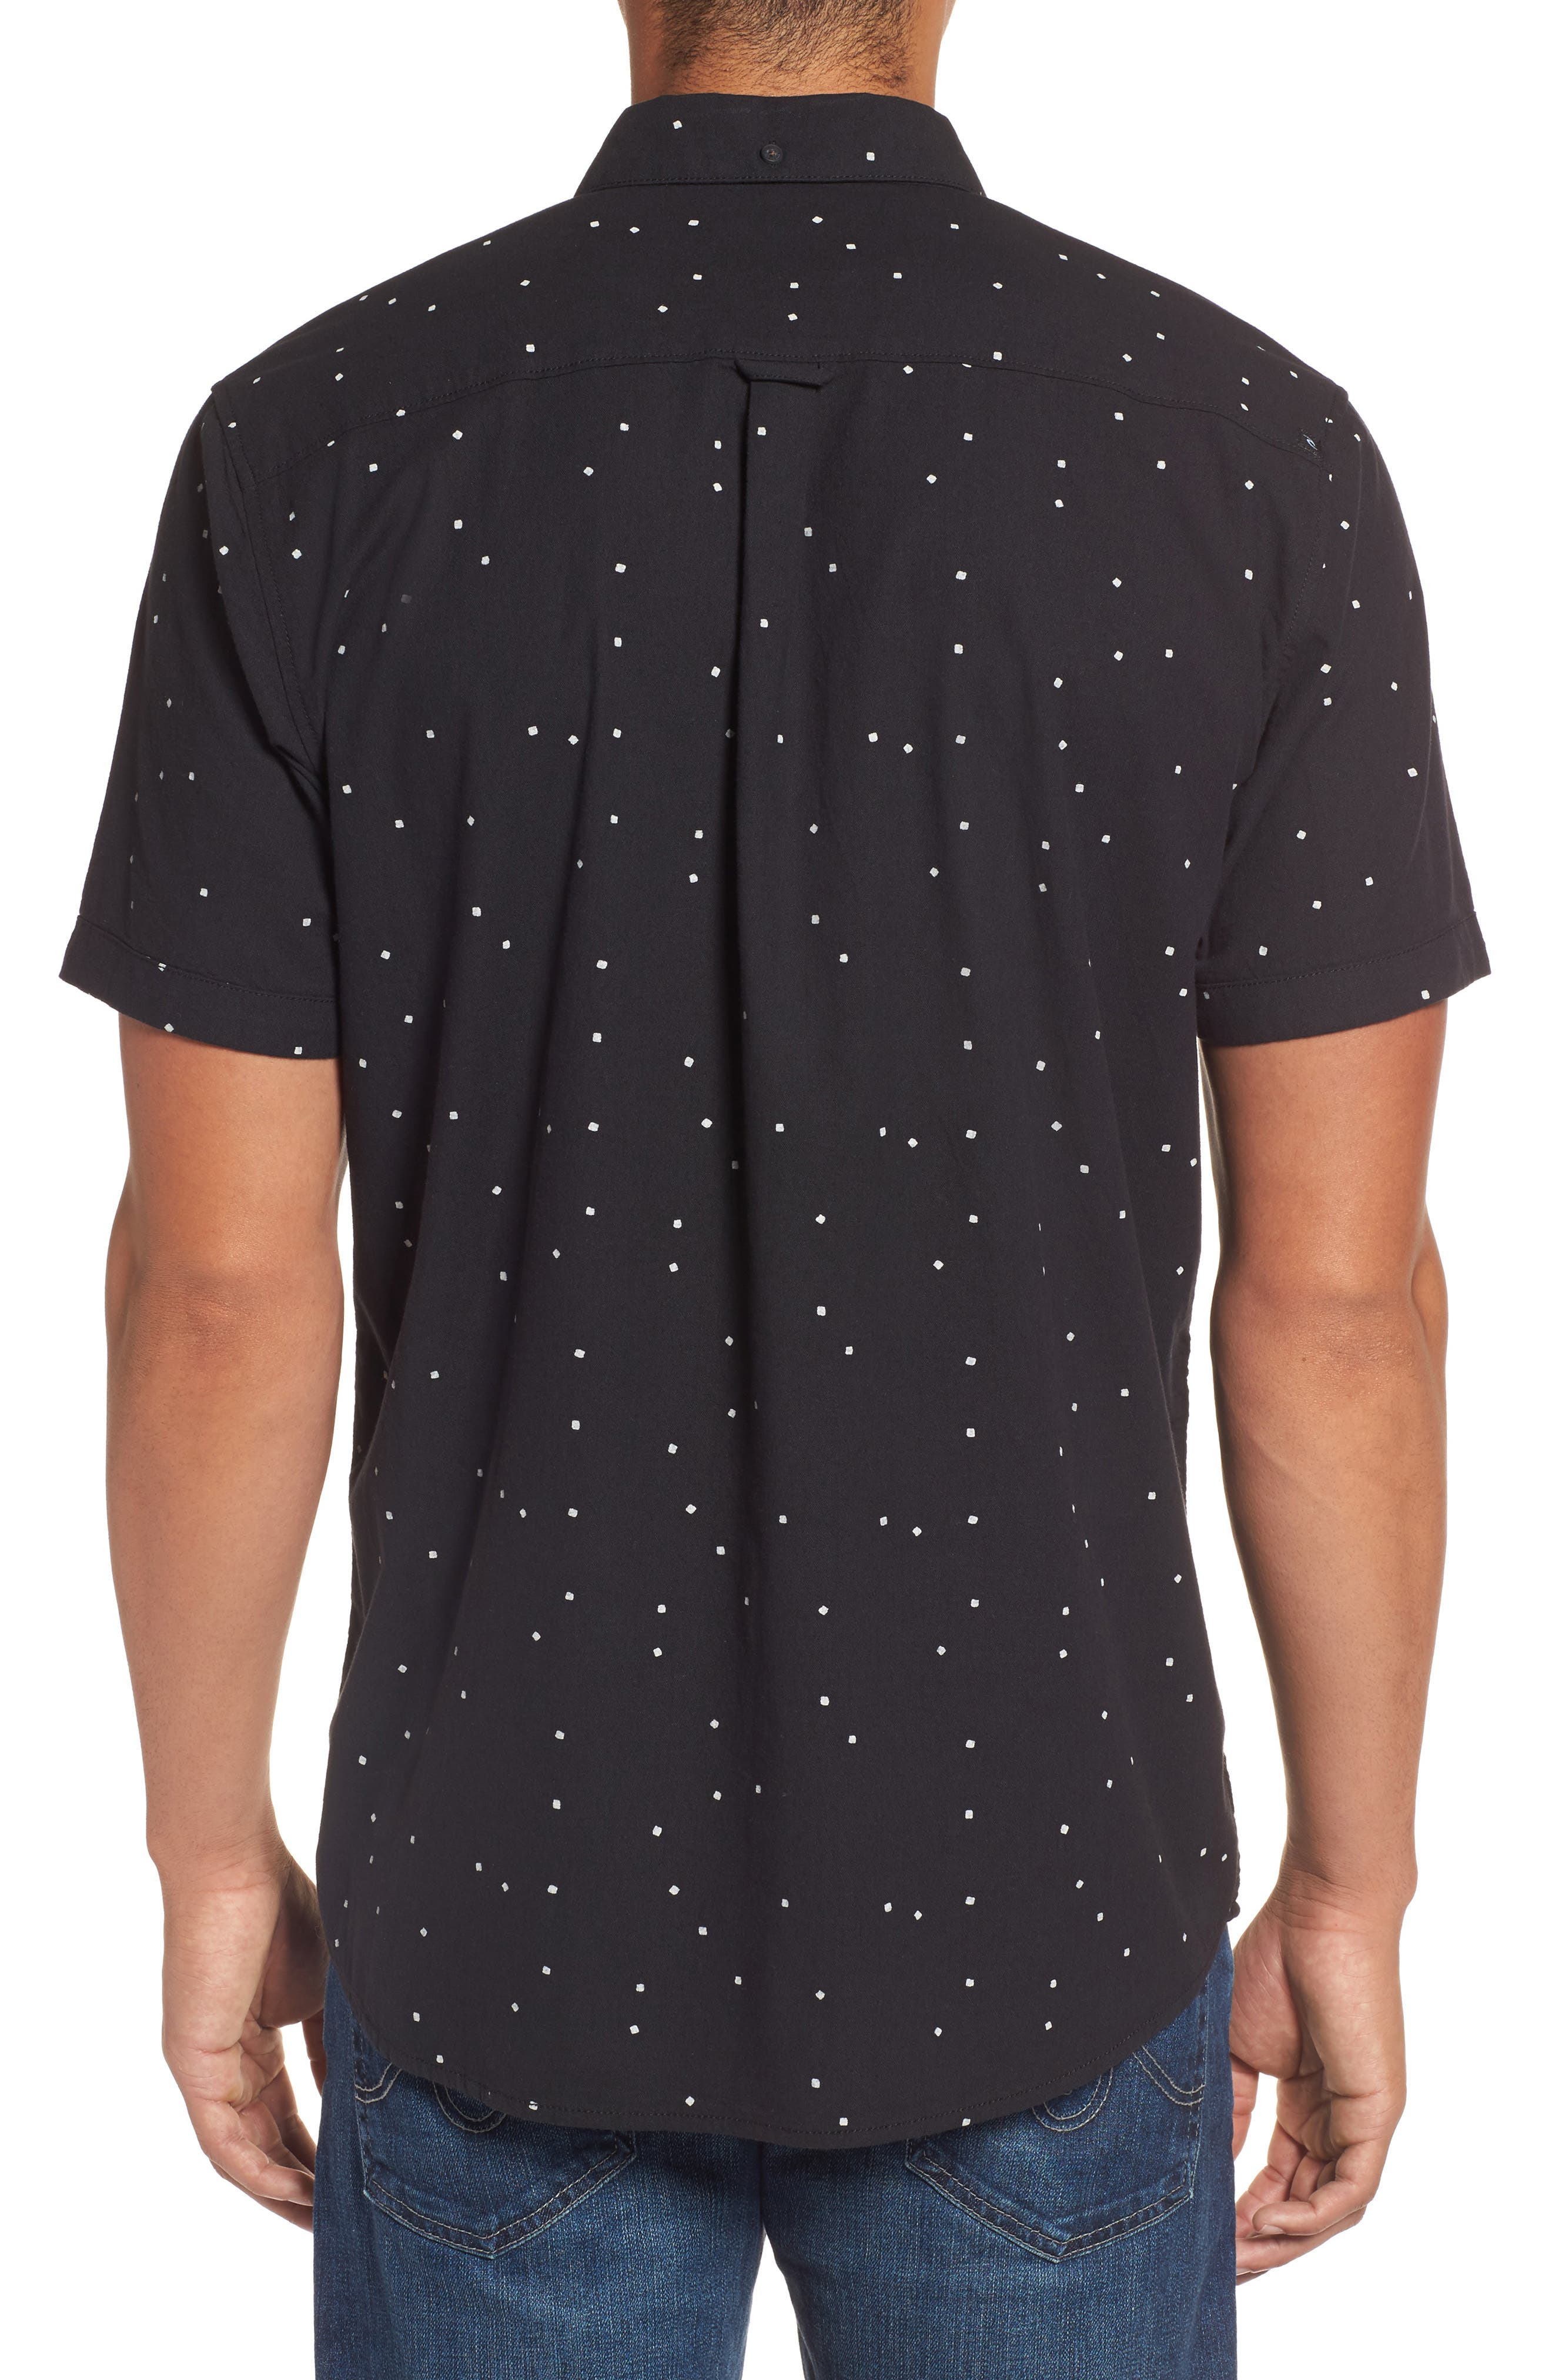 Alternate Image 2  - Rip Curl Mixter Short Sleeve Shirt